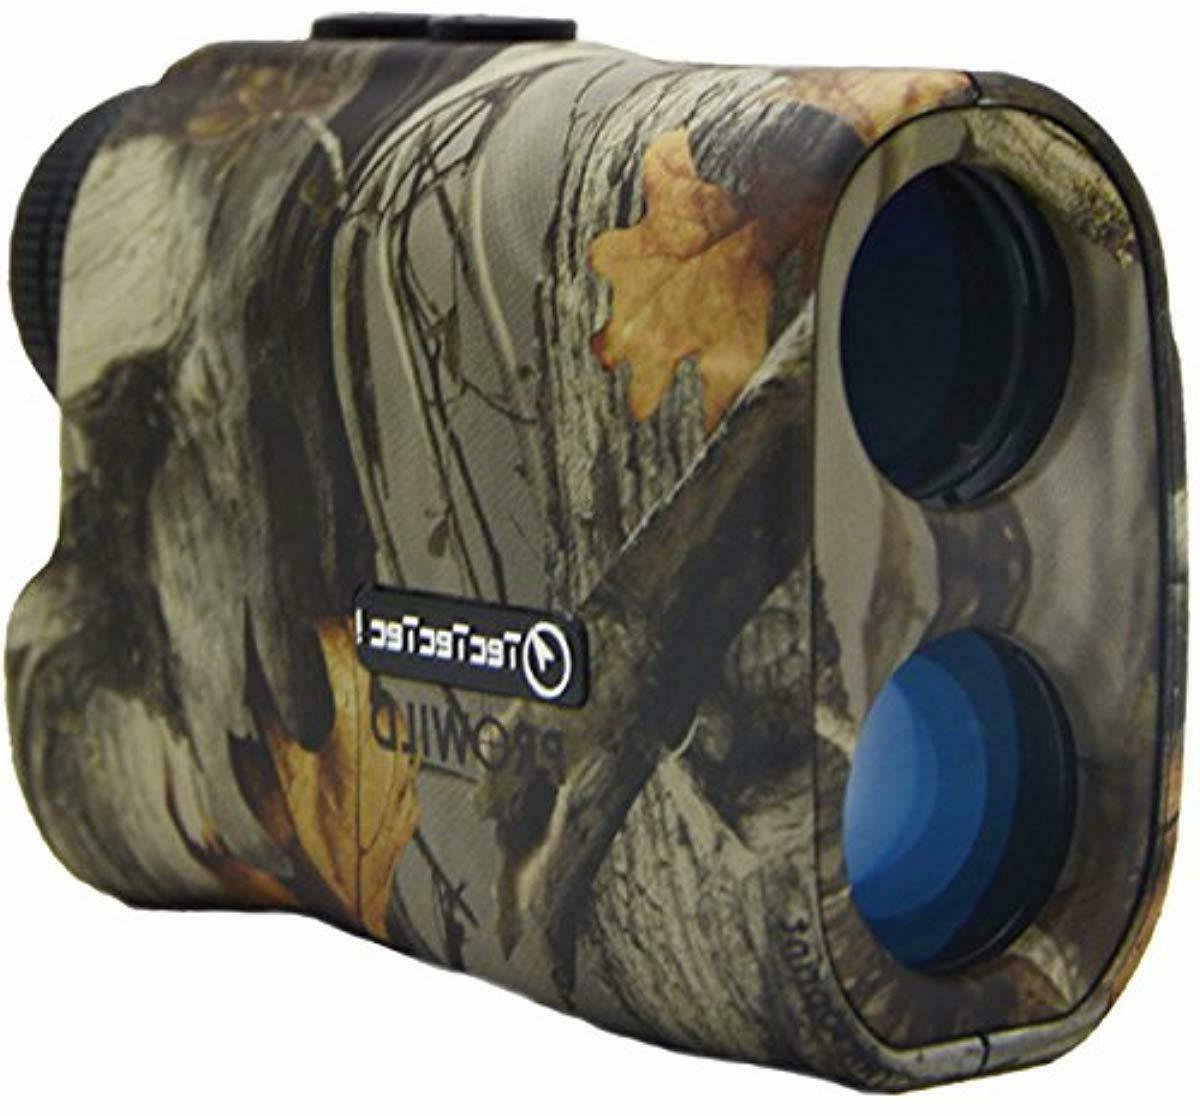 rangefinder for bowhunting yardage hunter a laser